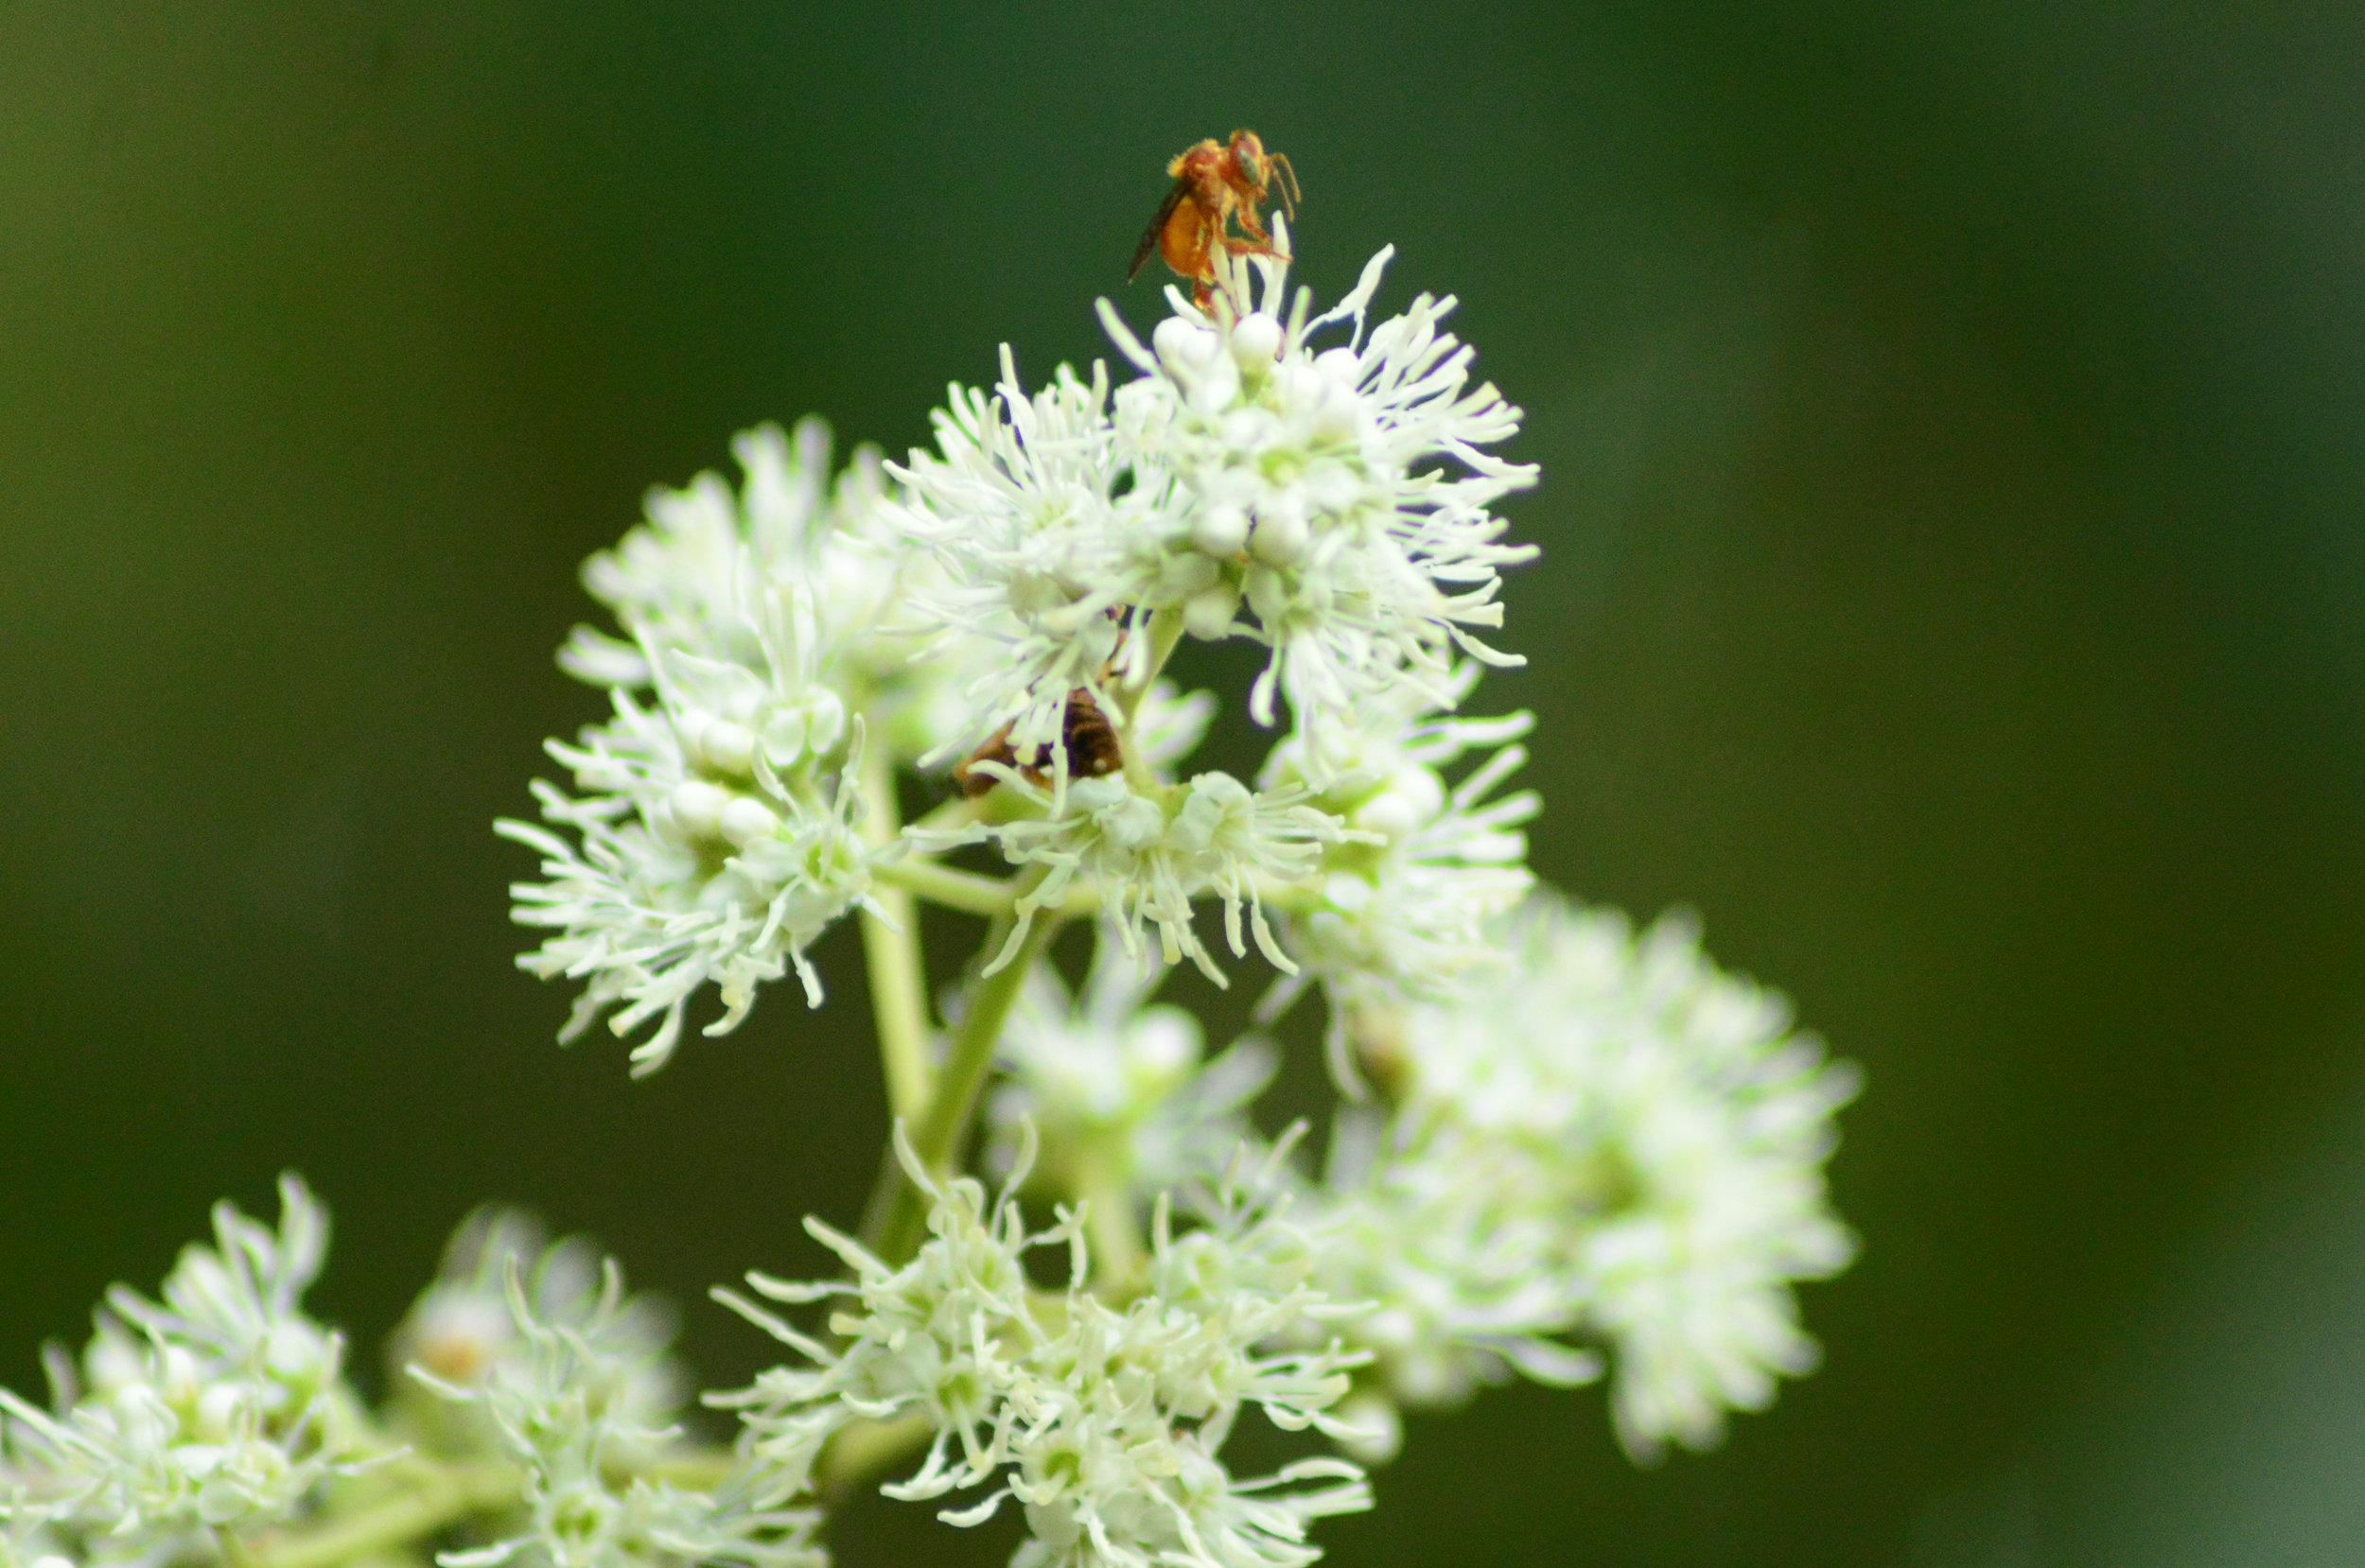 A  Trigona muzoensis  bee pollinates a  Miconia affinis  inflorescence in Gamboa, Panama. May 2016.